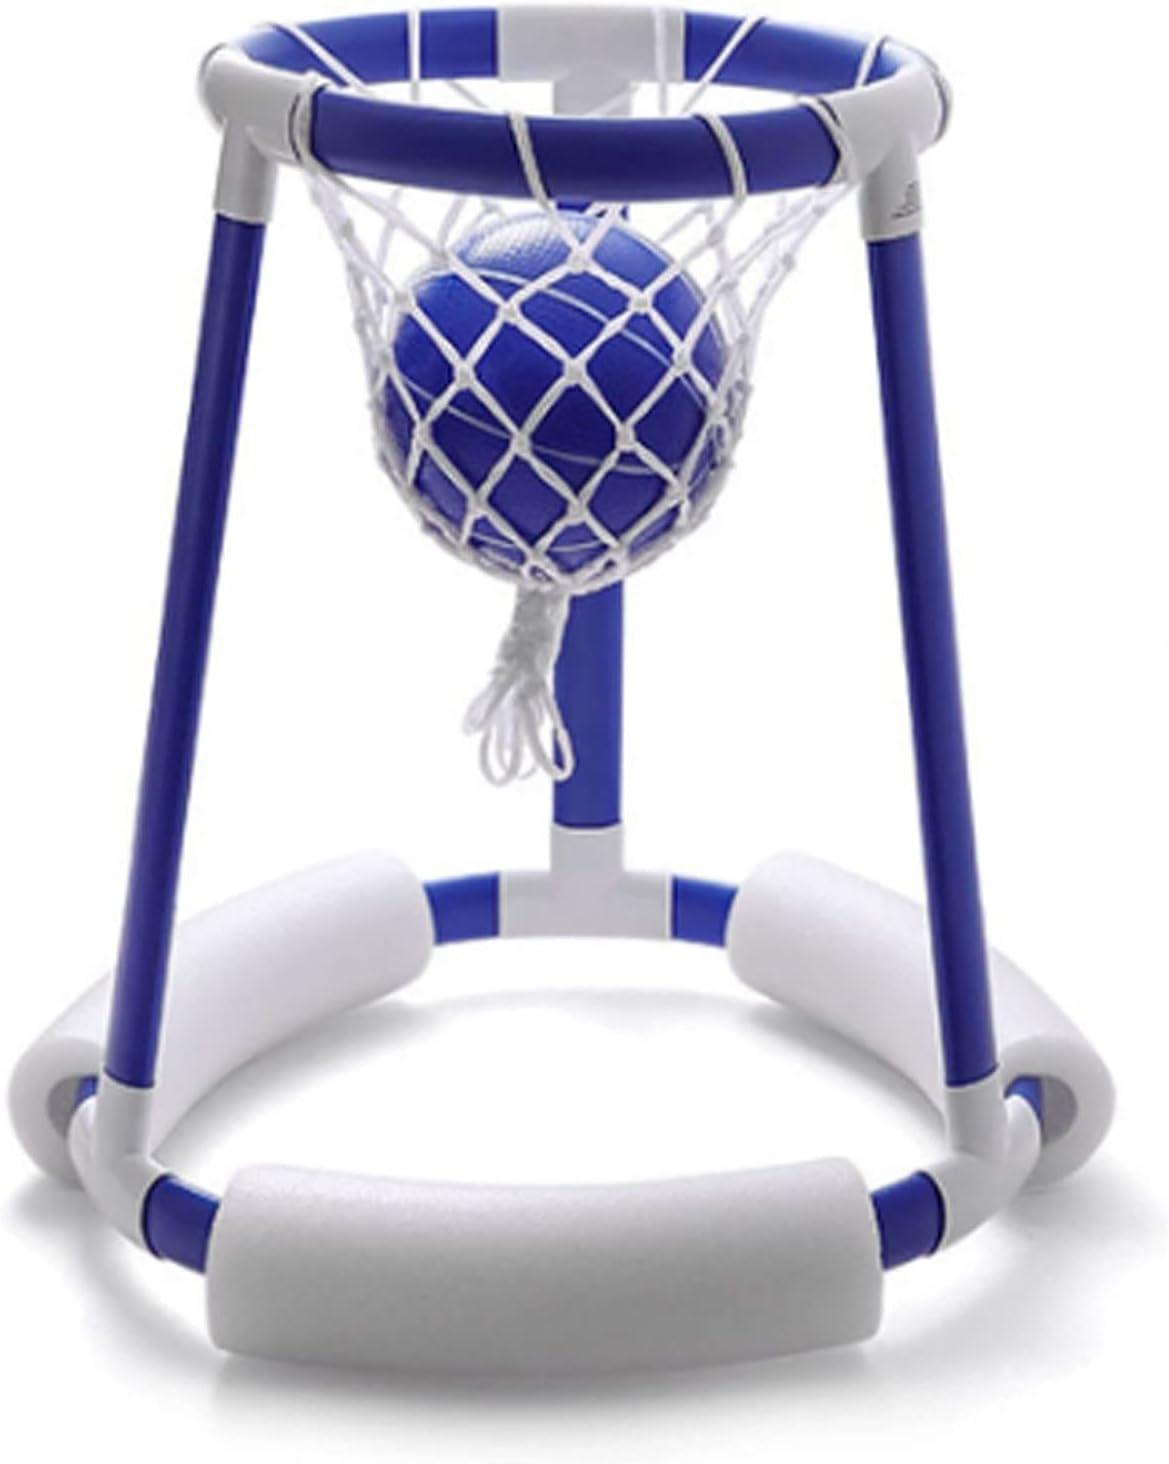 GAODINGD Fashion Max 74% OFF Pool Basketball Hoops Set Bas Água Lutuante De Jogo